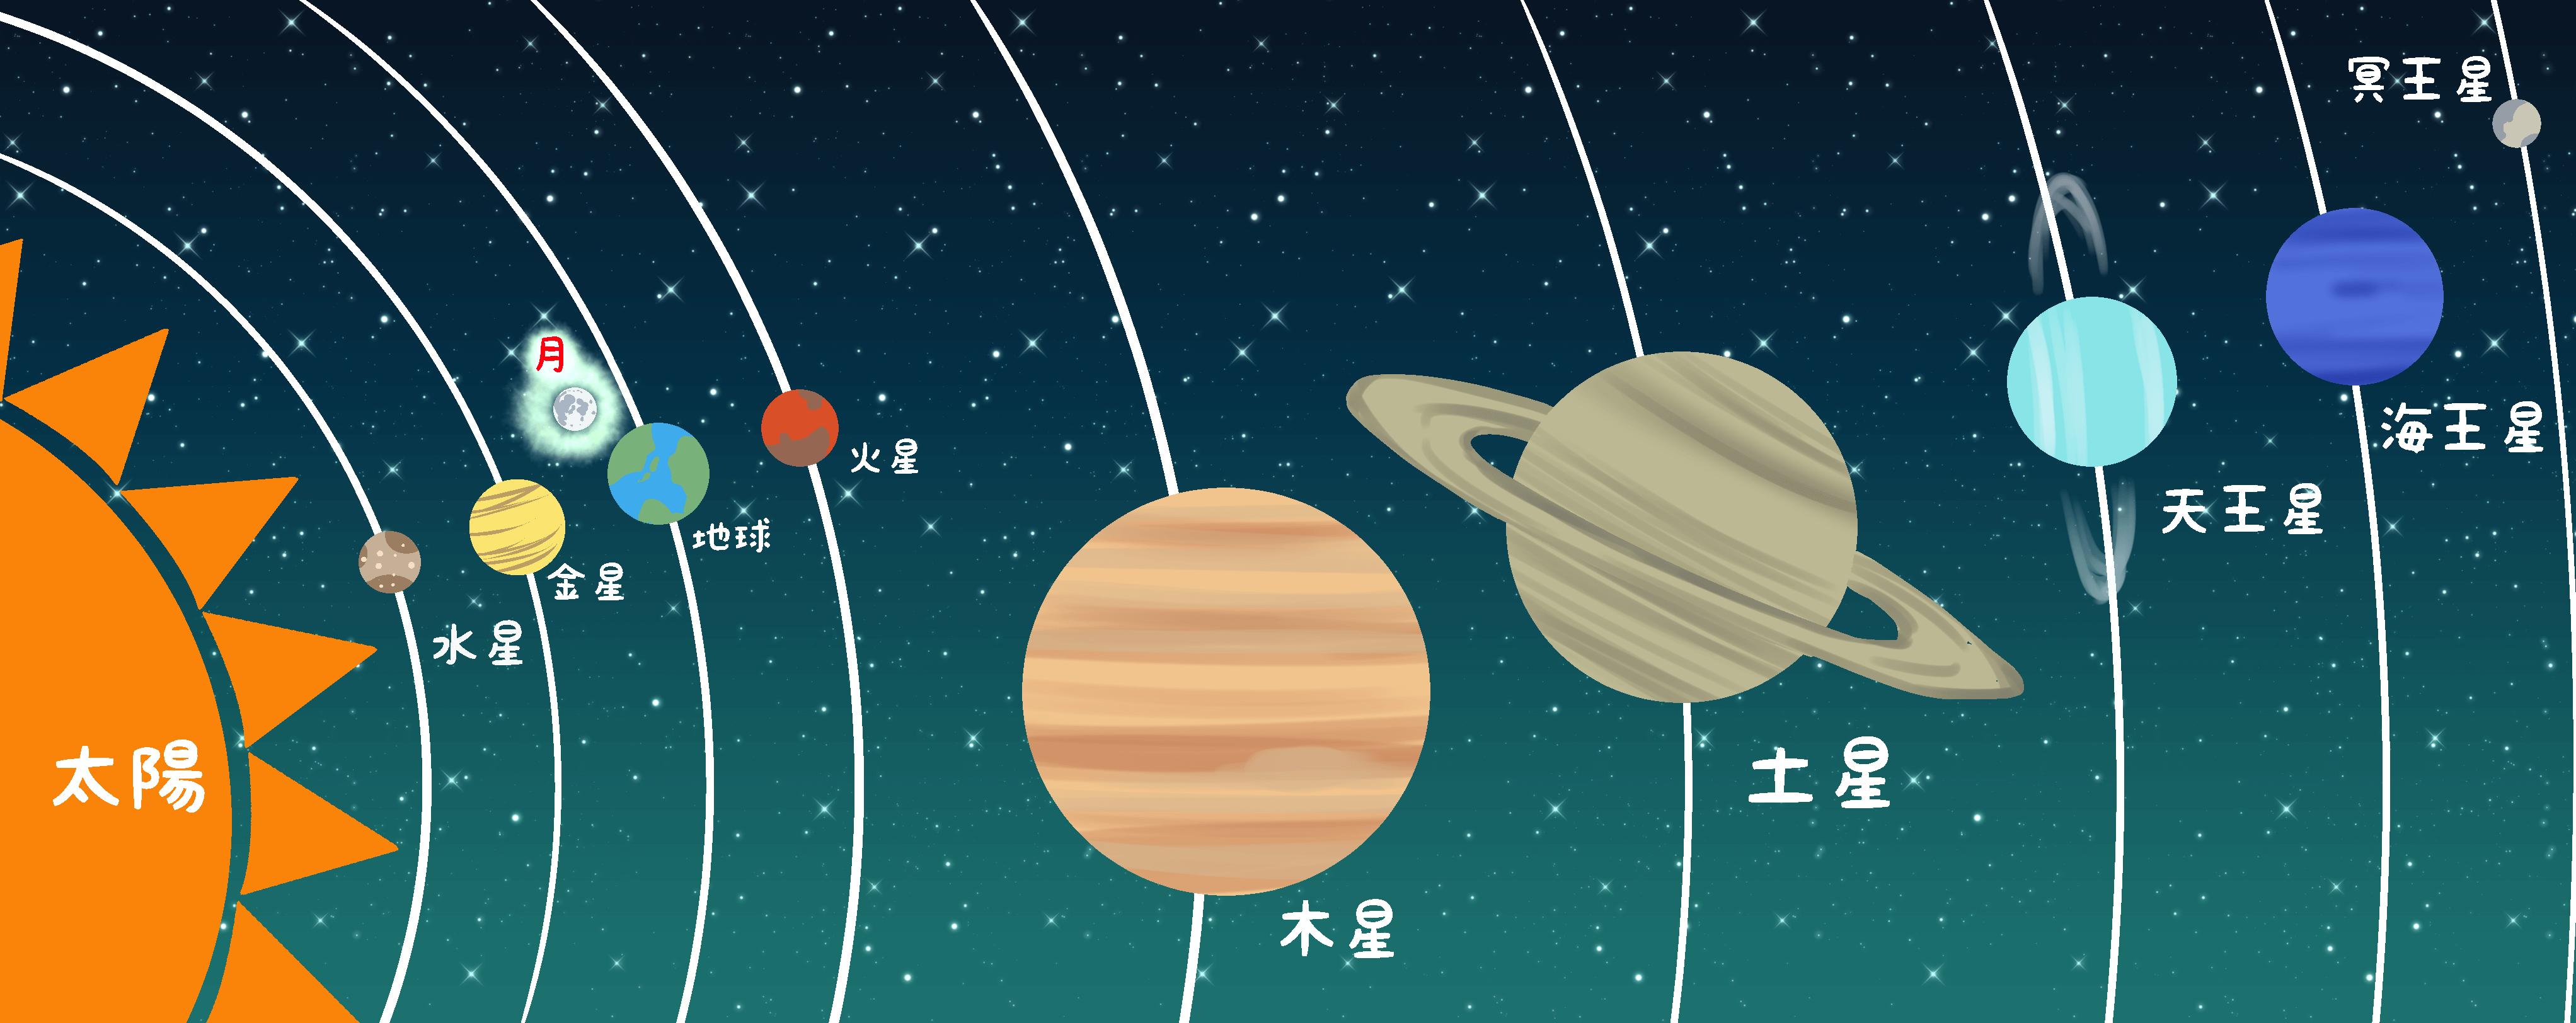 Solar system moon2